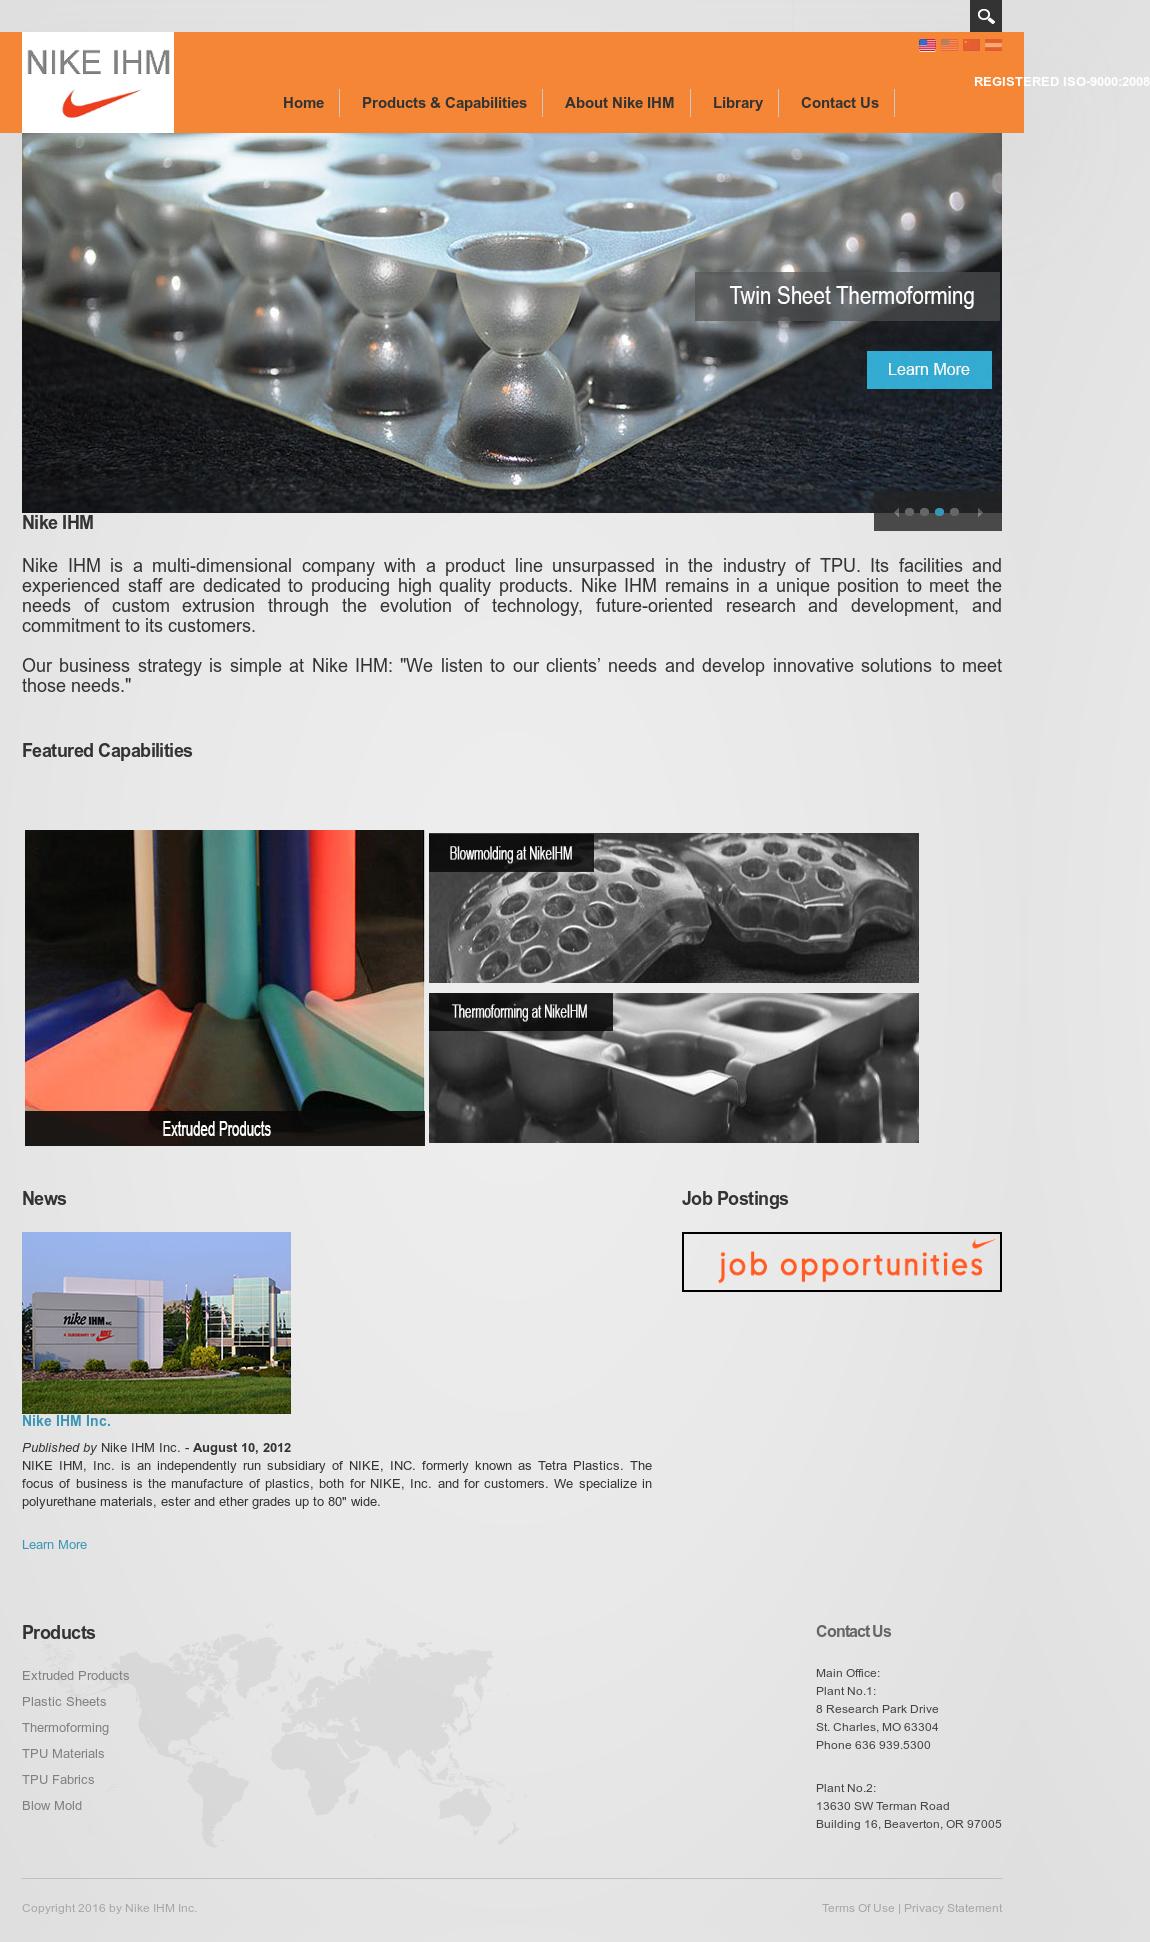 Nike Ihm website history